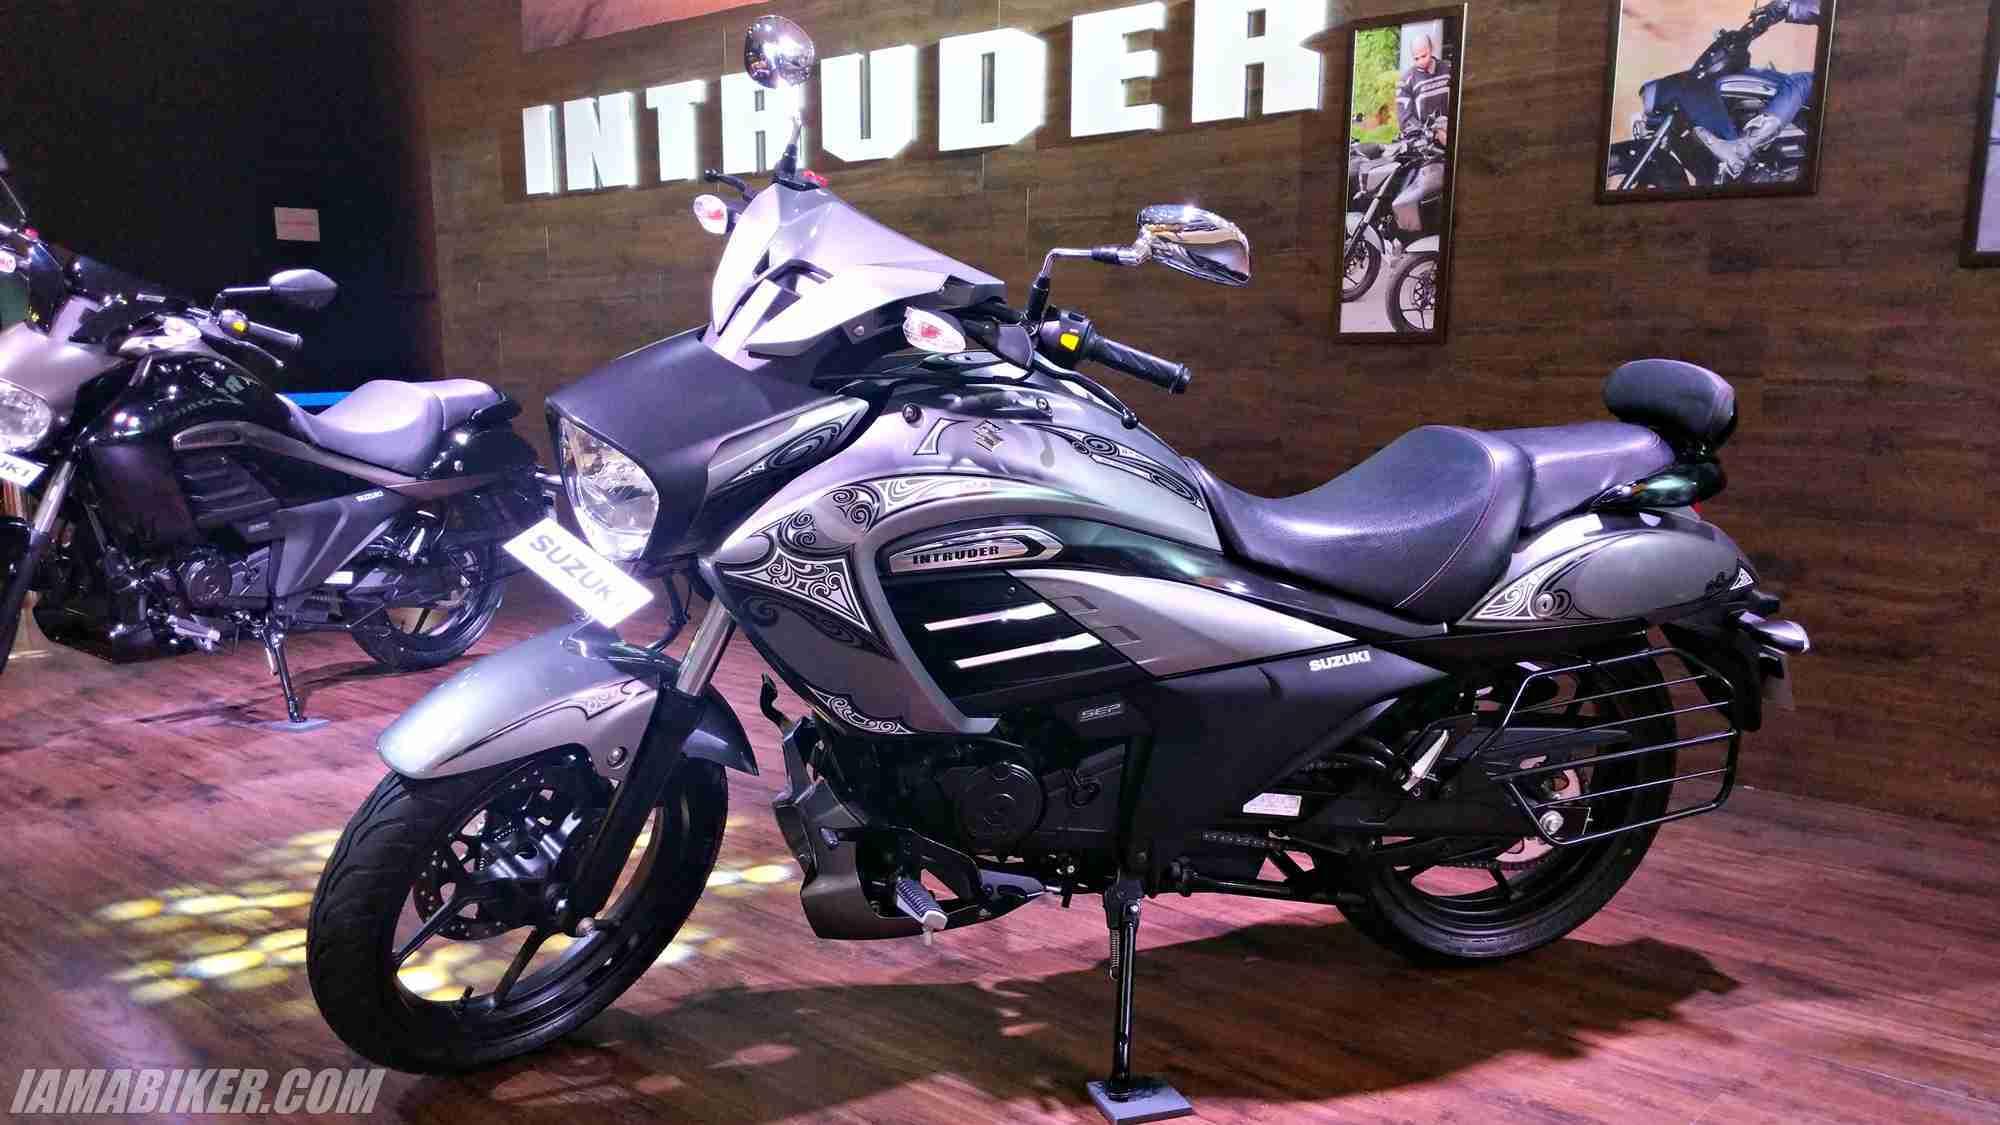 Suzuki Intruder Fi launched